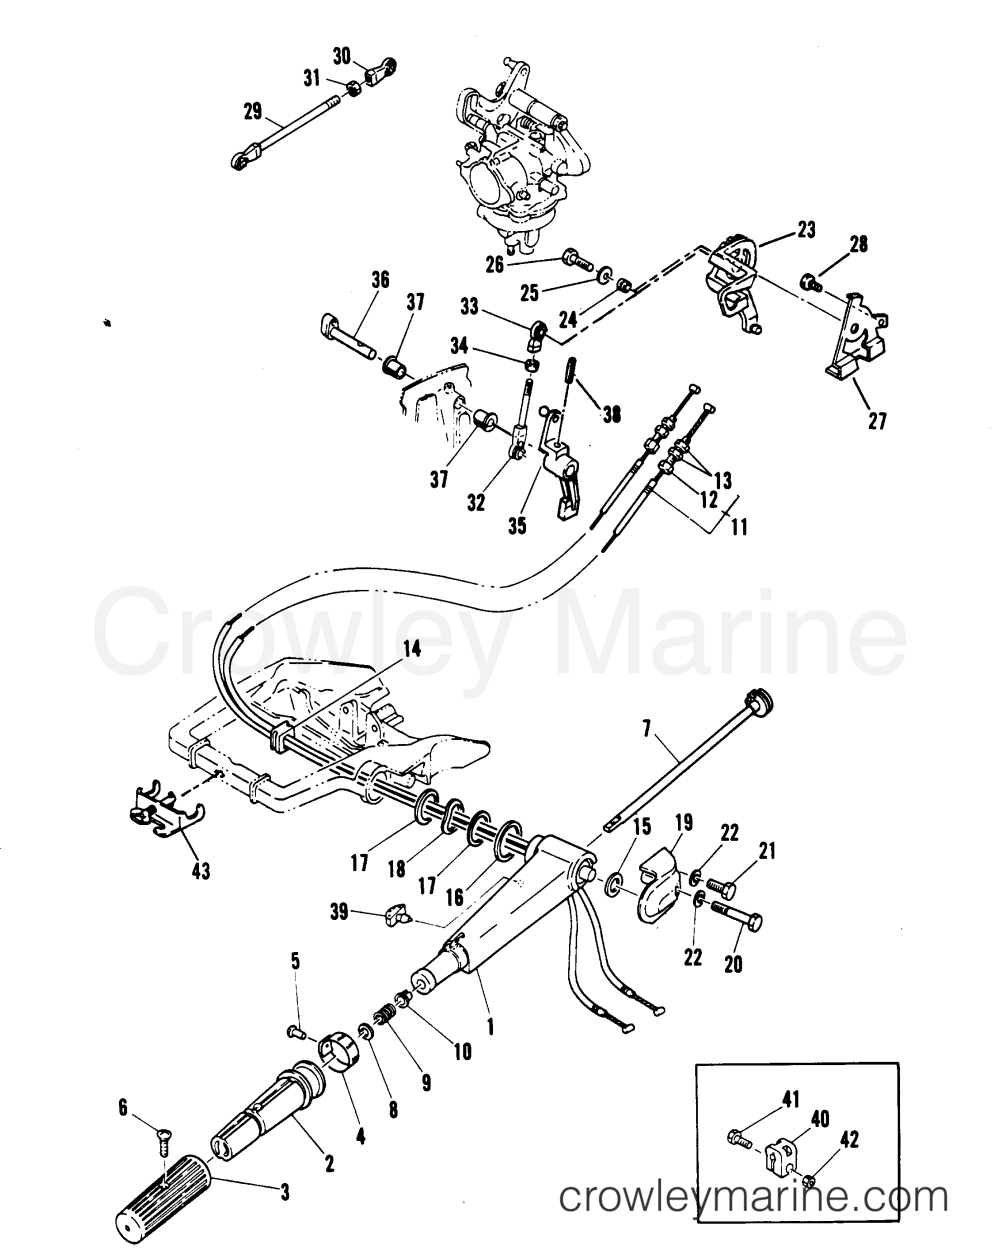 medium resolution of wrg 3813 mariner throttle control wiring diagram mariner throttle control wiring diagram source mercury control box